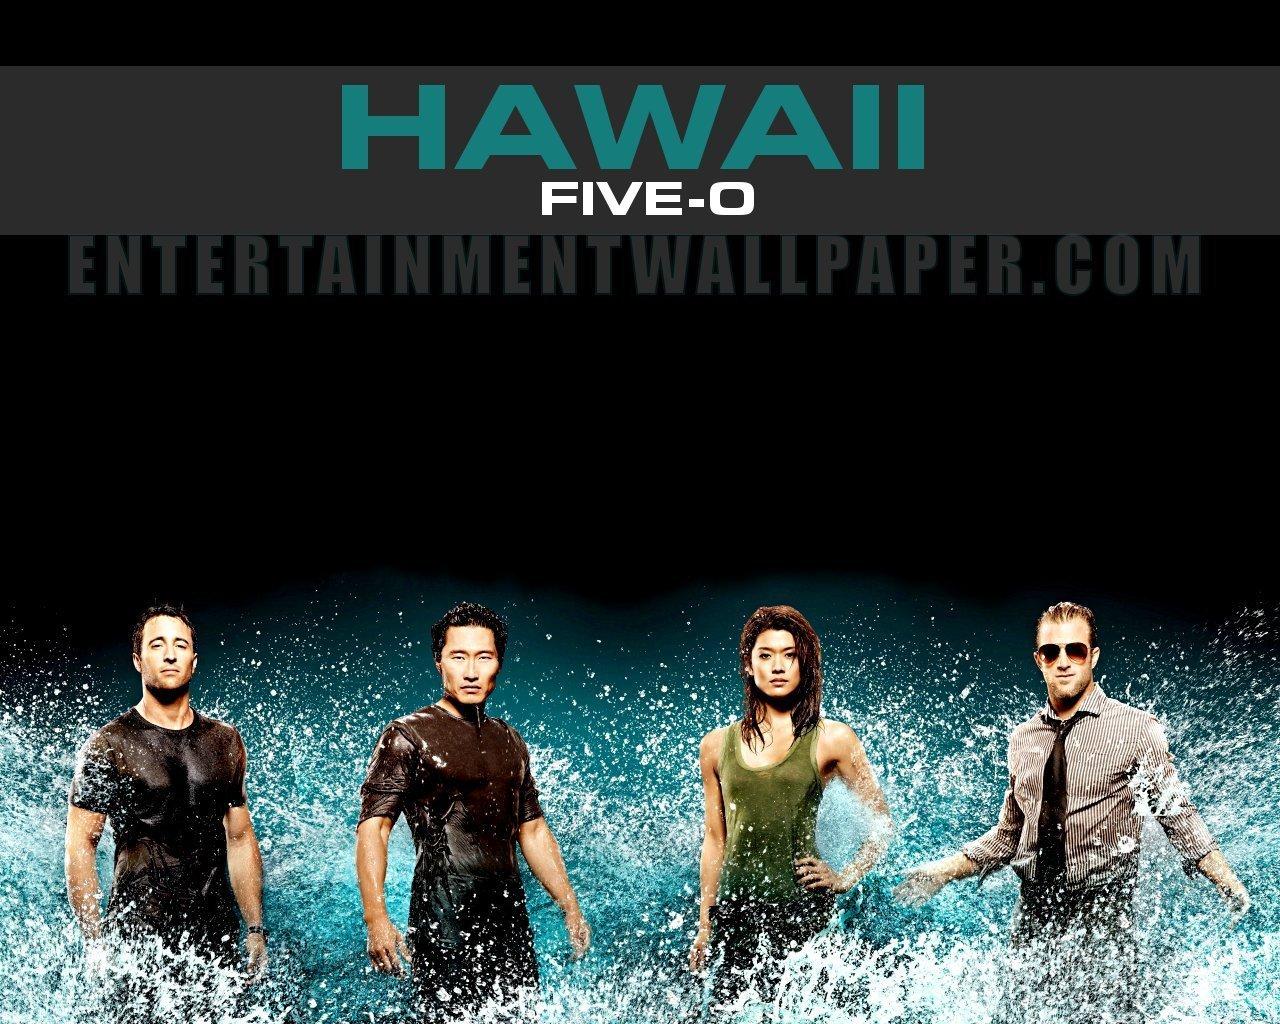 Hawaii Five O Wallpaper: Hawaii Five-0 (2010) Images Hawaii Five-O HD Wallpaper And